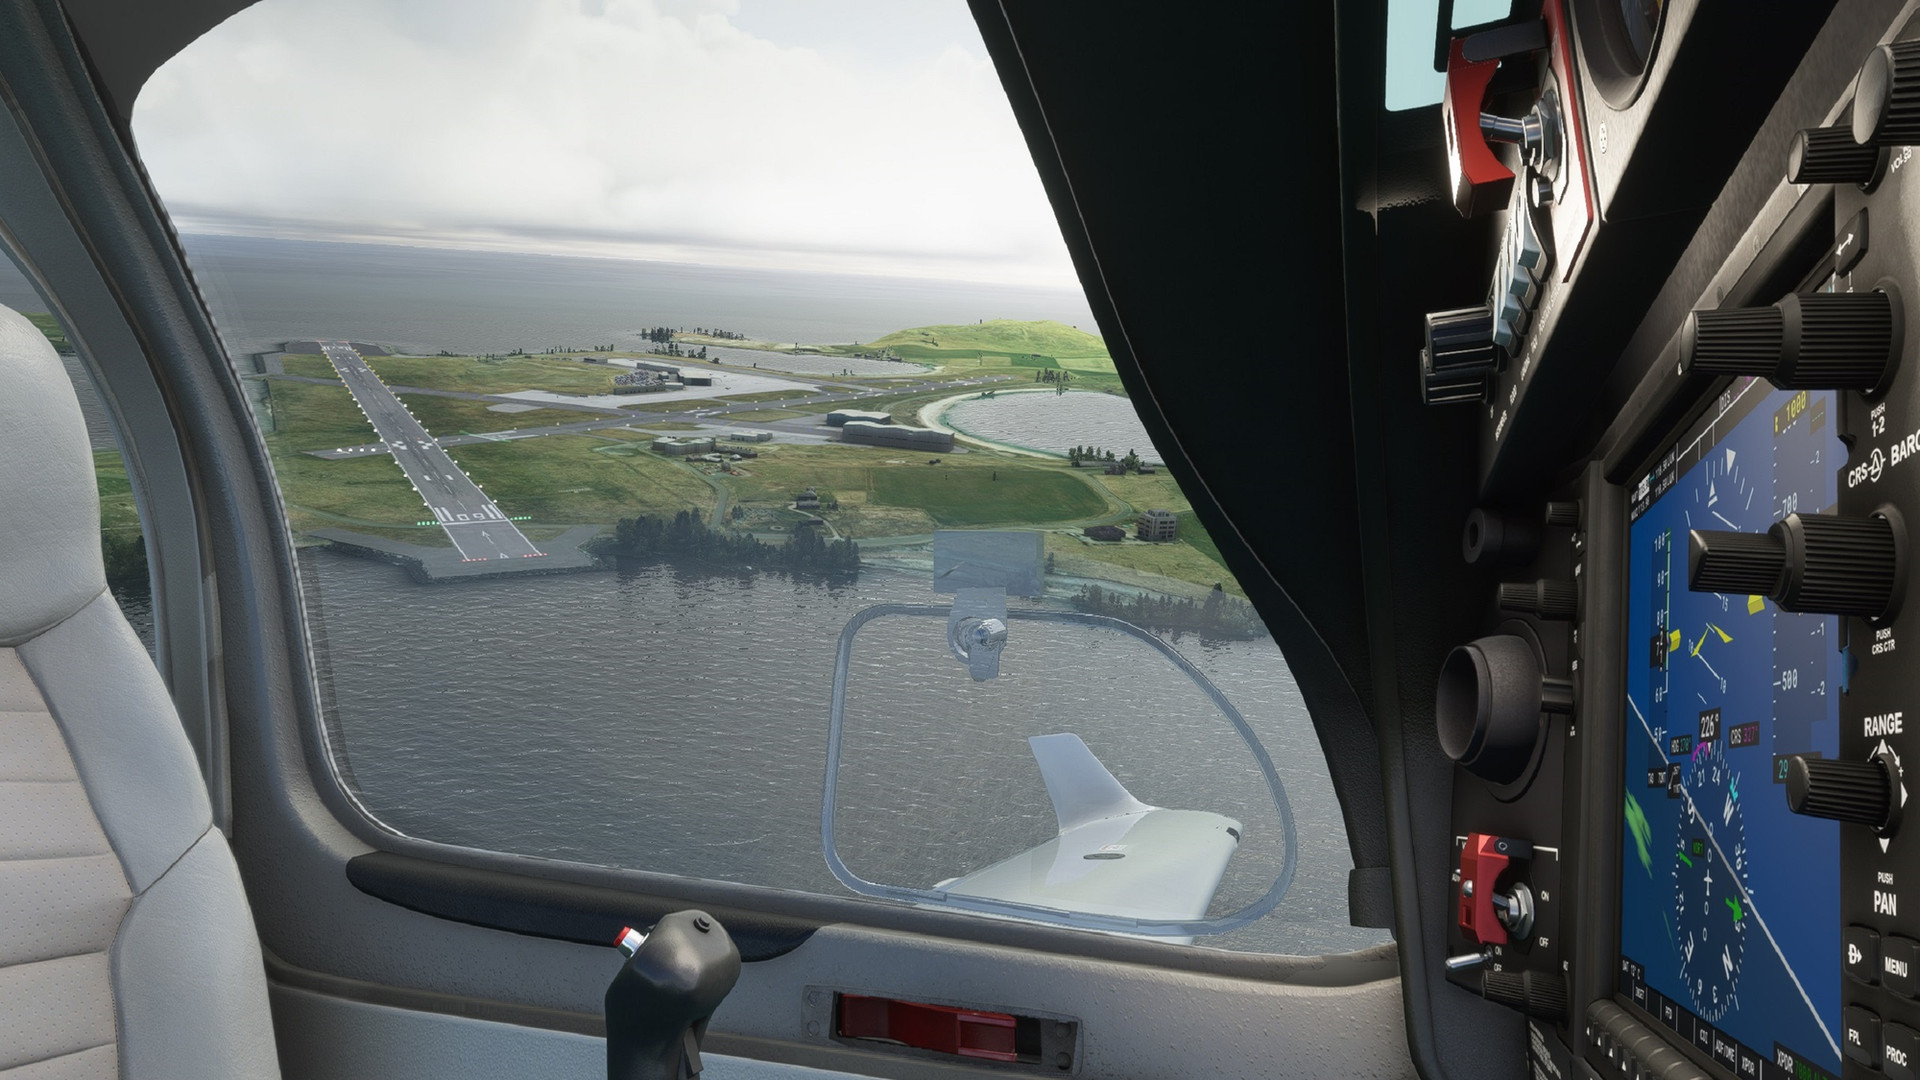 Crosswinds over the Shetlands